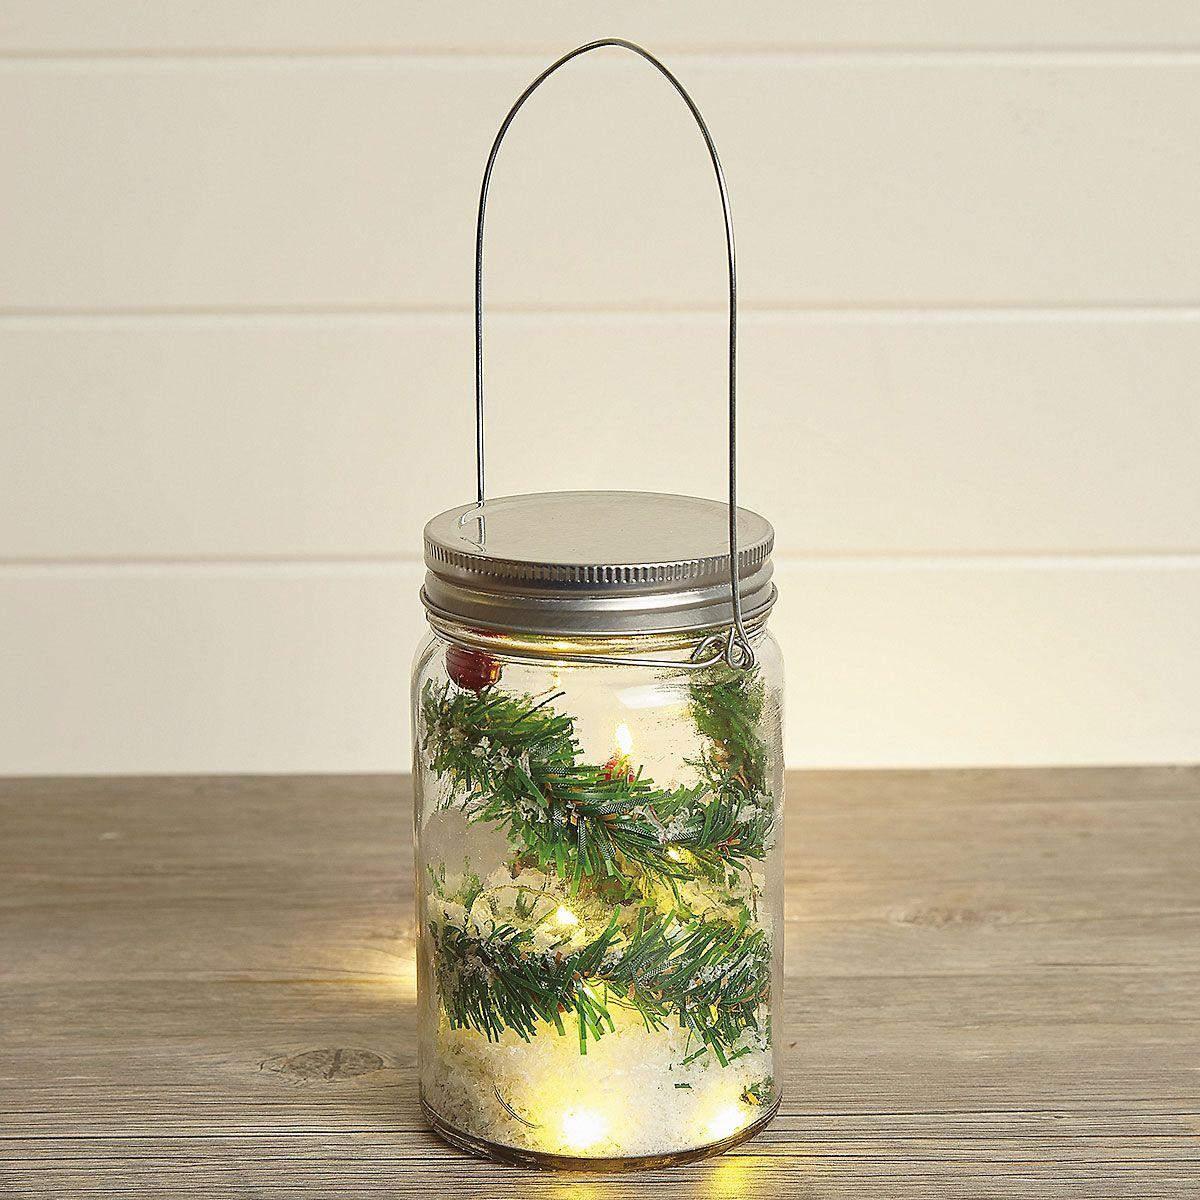 Pine & Berries LED in Jar